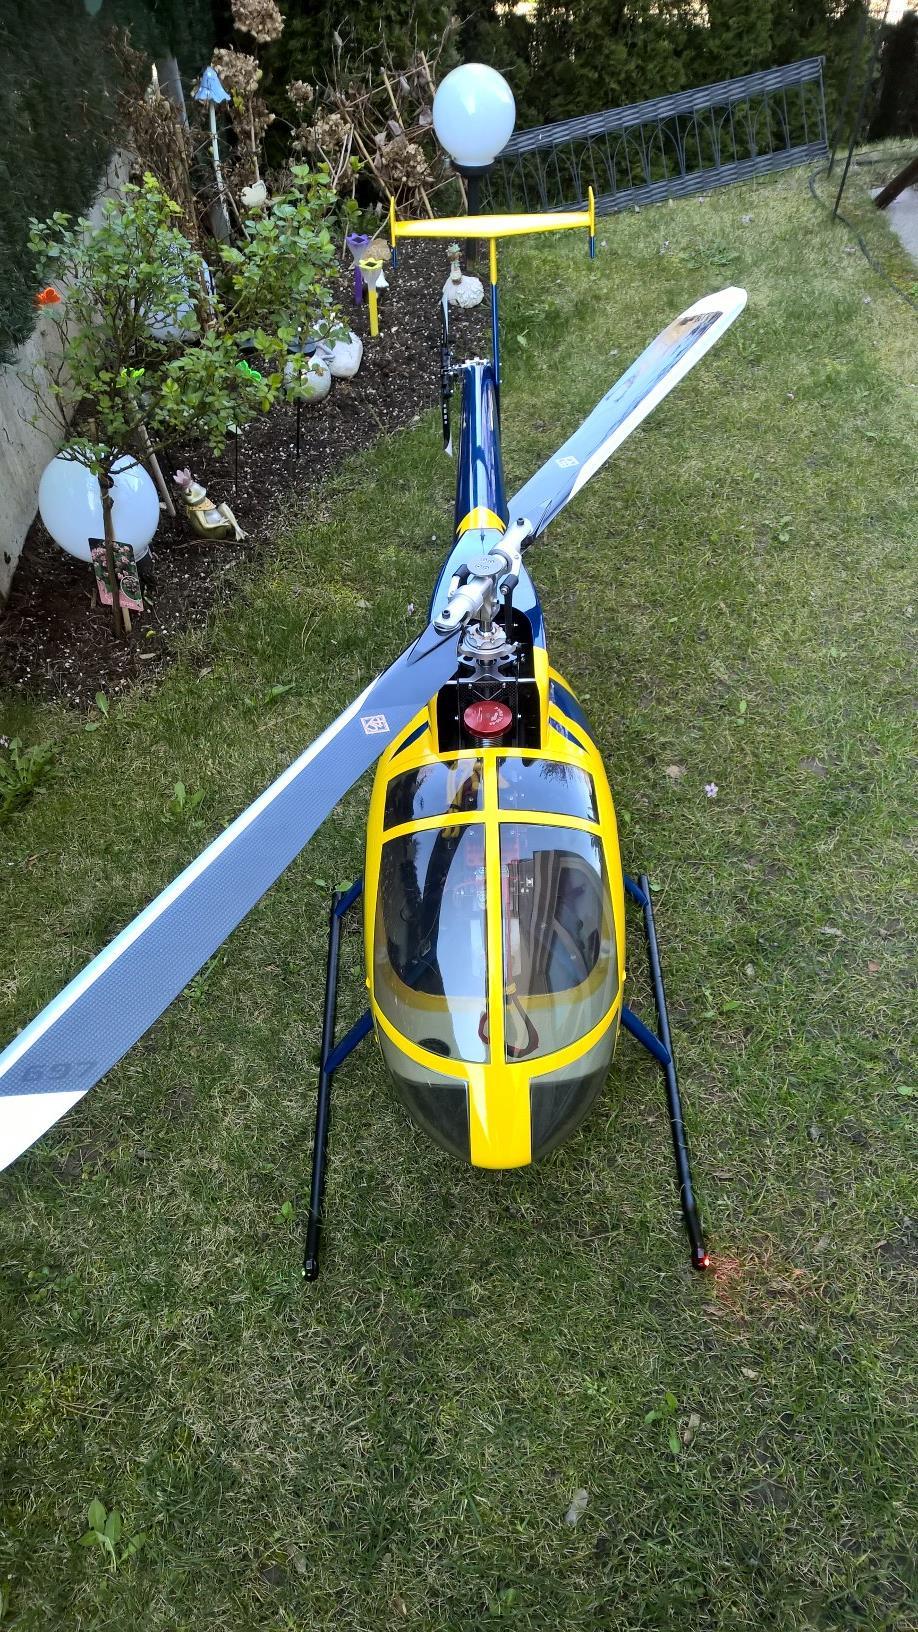 Hughes 500E -BIG FUN SCALE